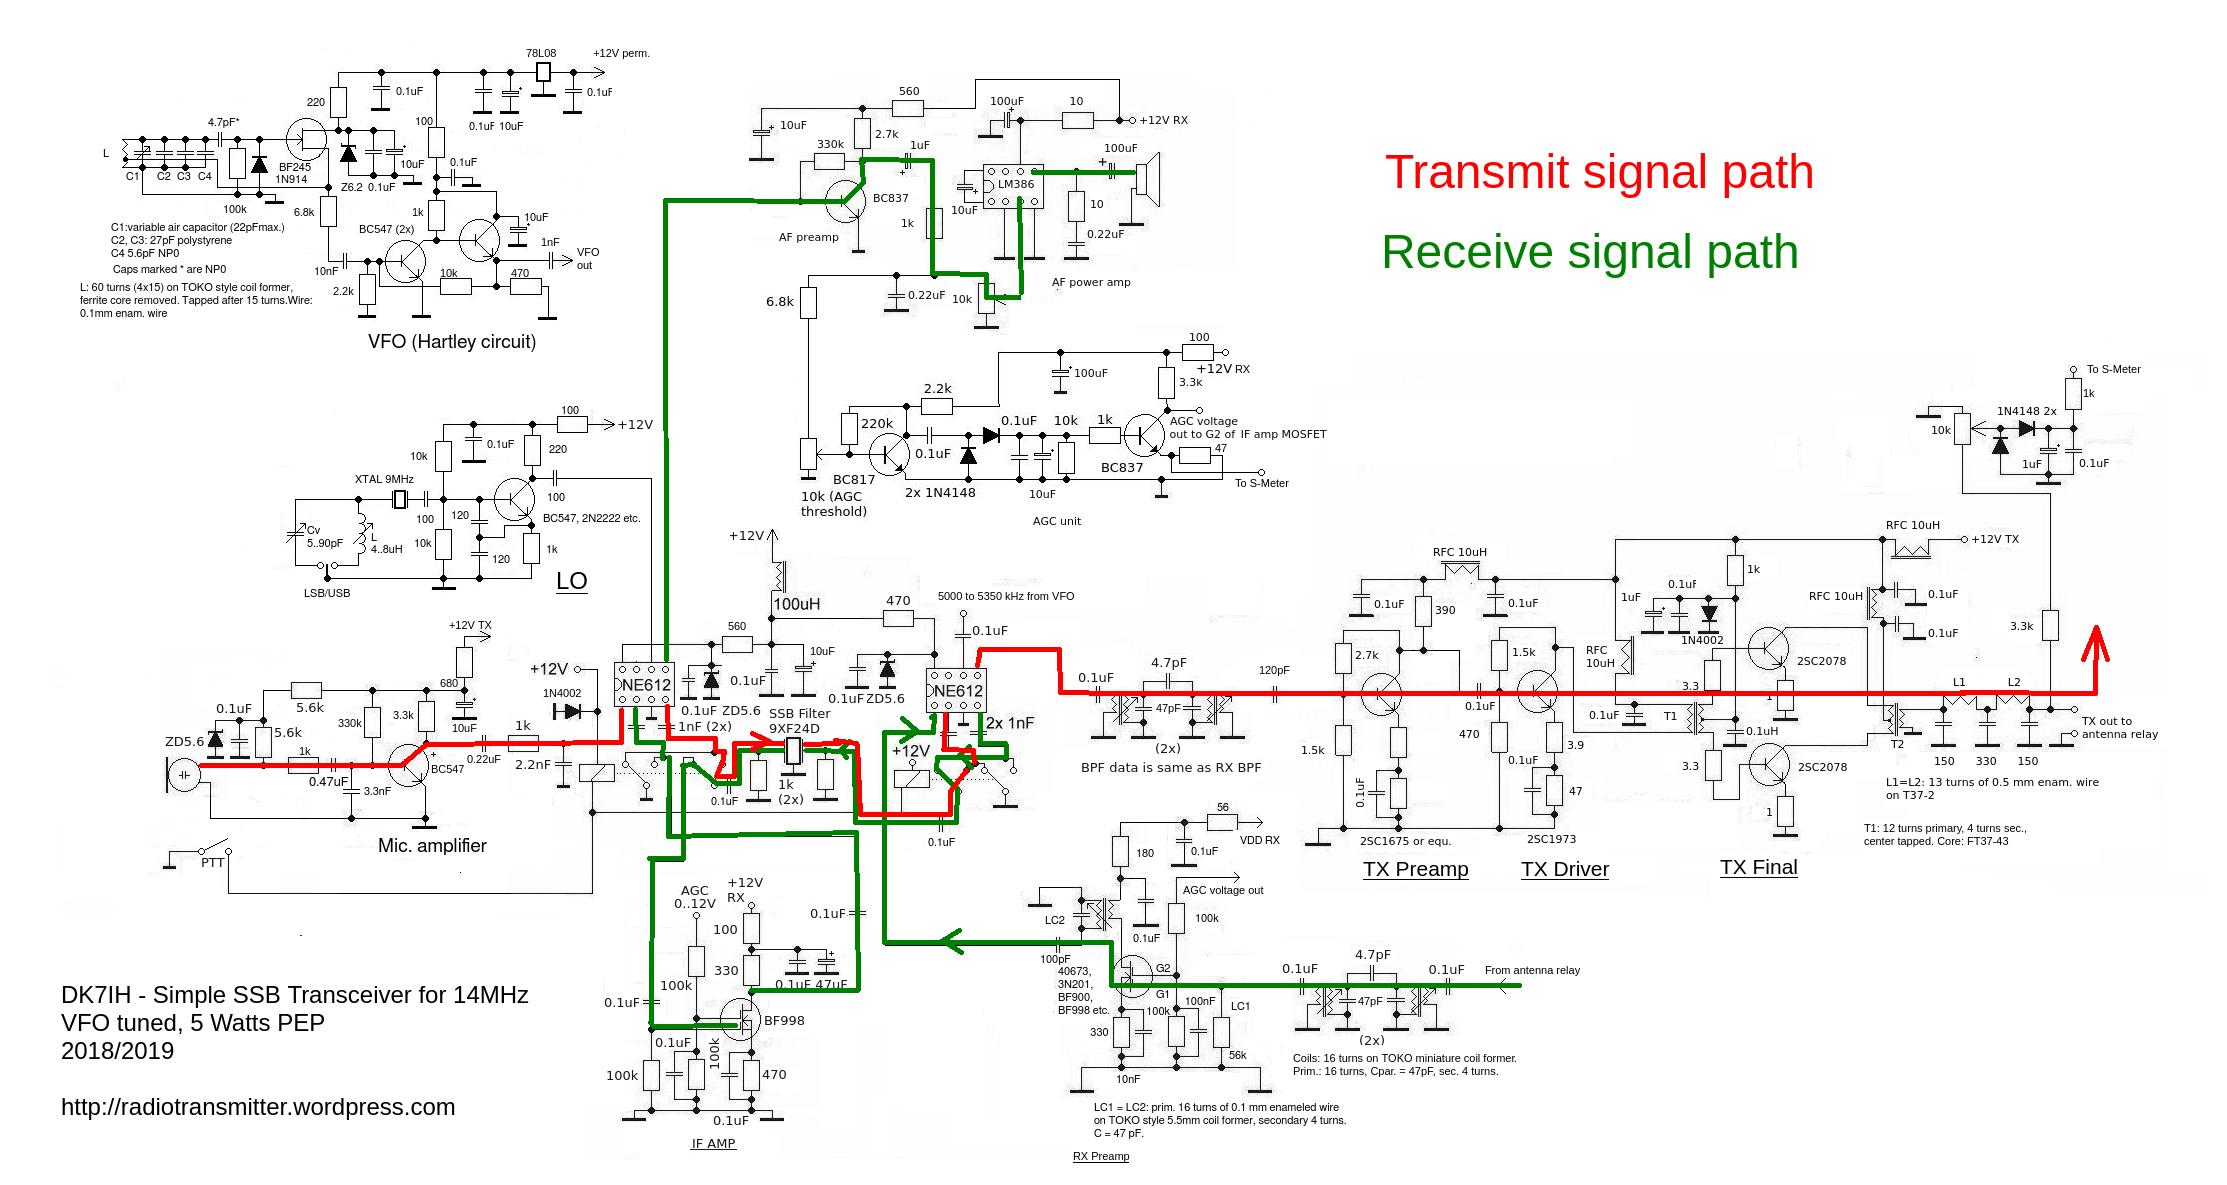 medium resolution of peter rachow amateur radio engineering projects peter rachow dk7ih fig 416 block diagram of ssb transmitter